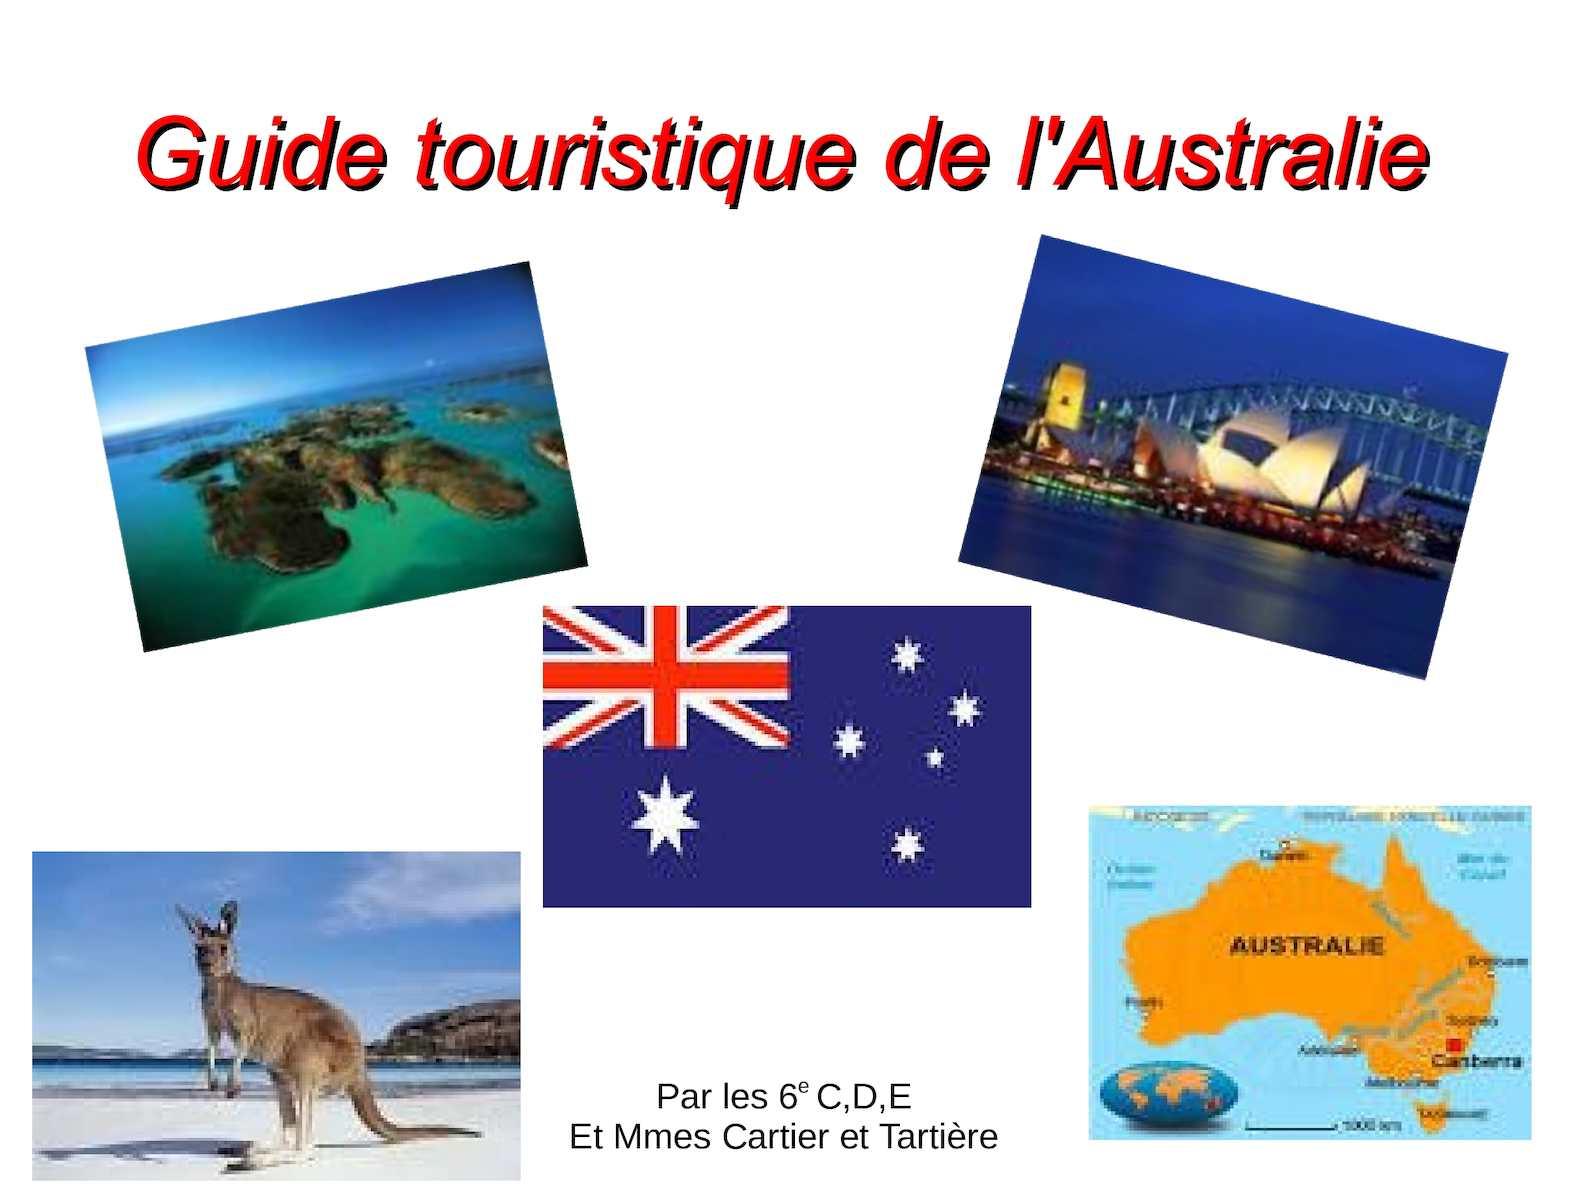 Australie Guide Guide Calaméo TouristiqueL' TouristiqueL' Calaméo Australie XikOPZu